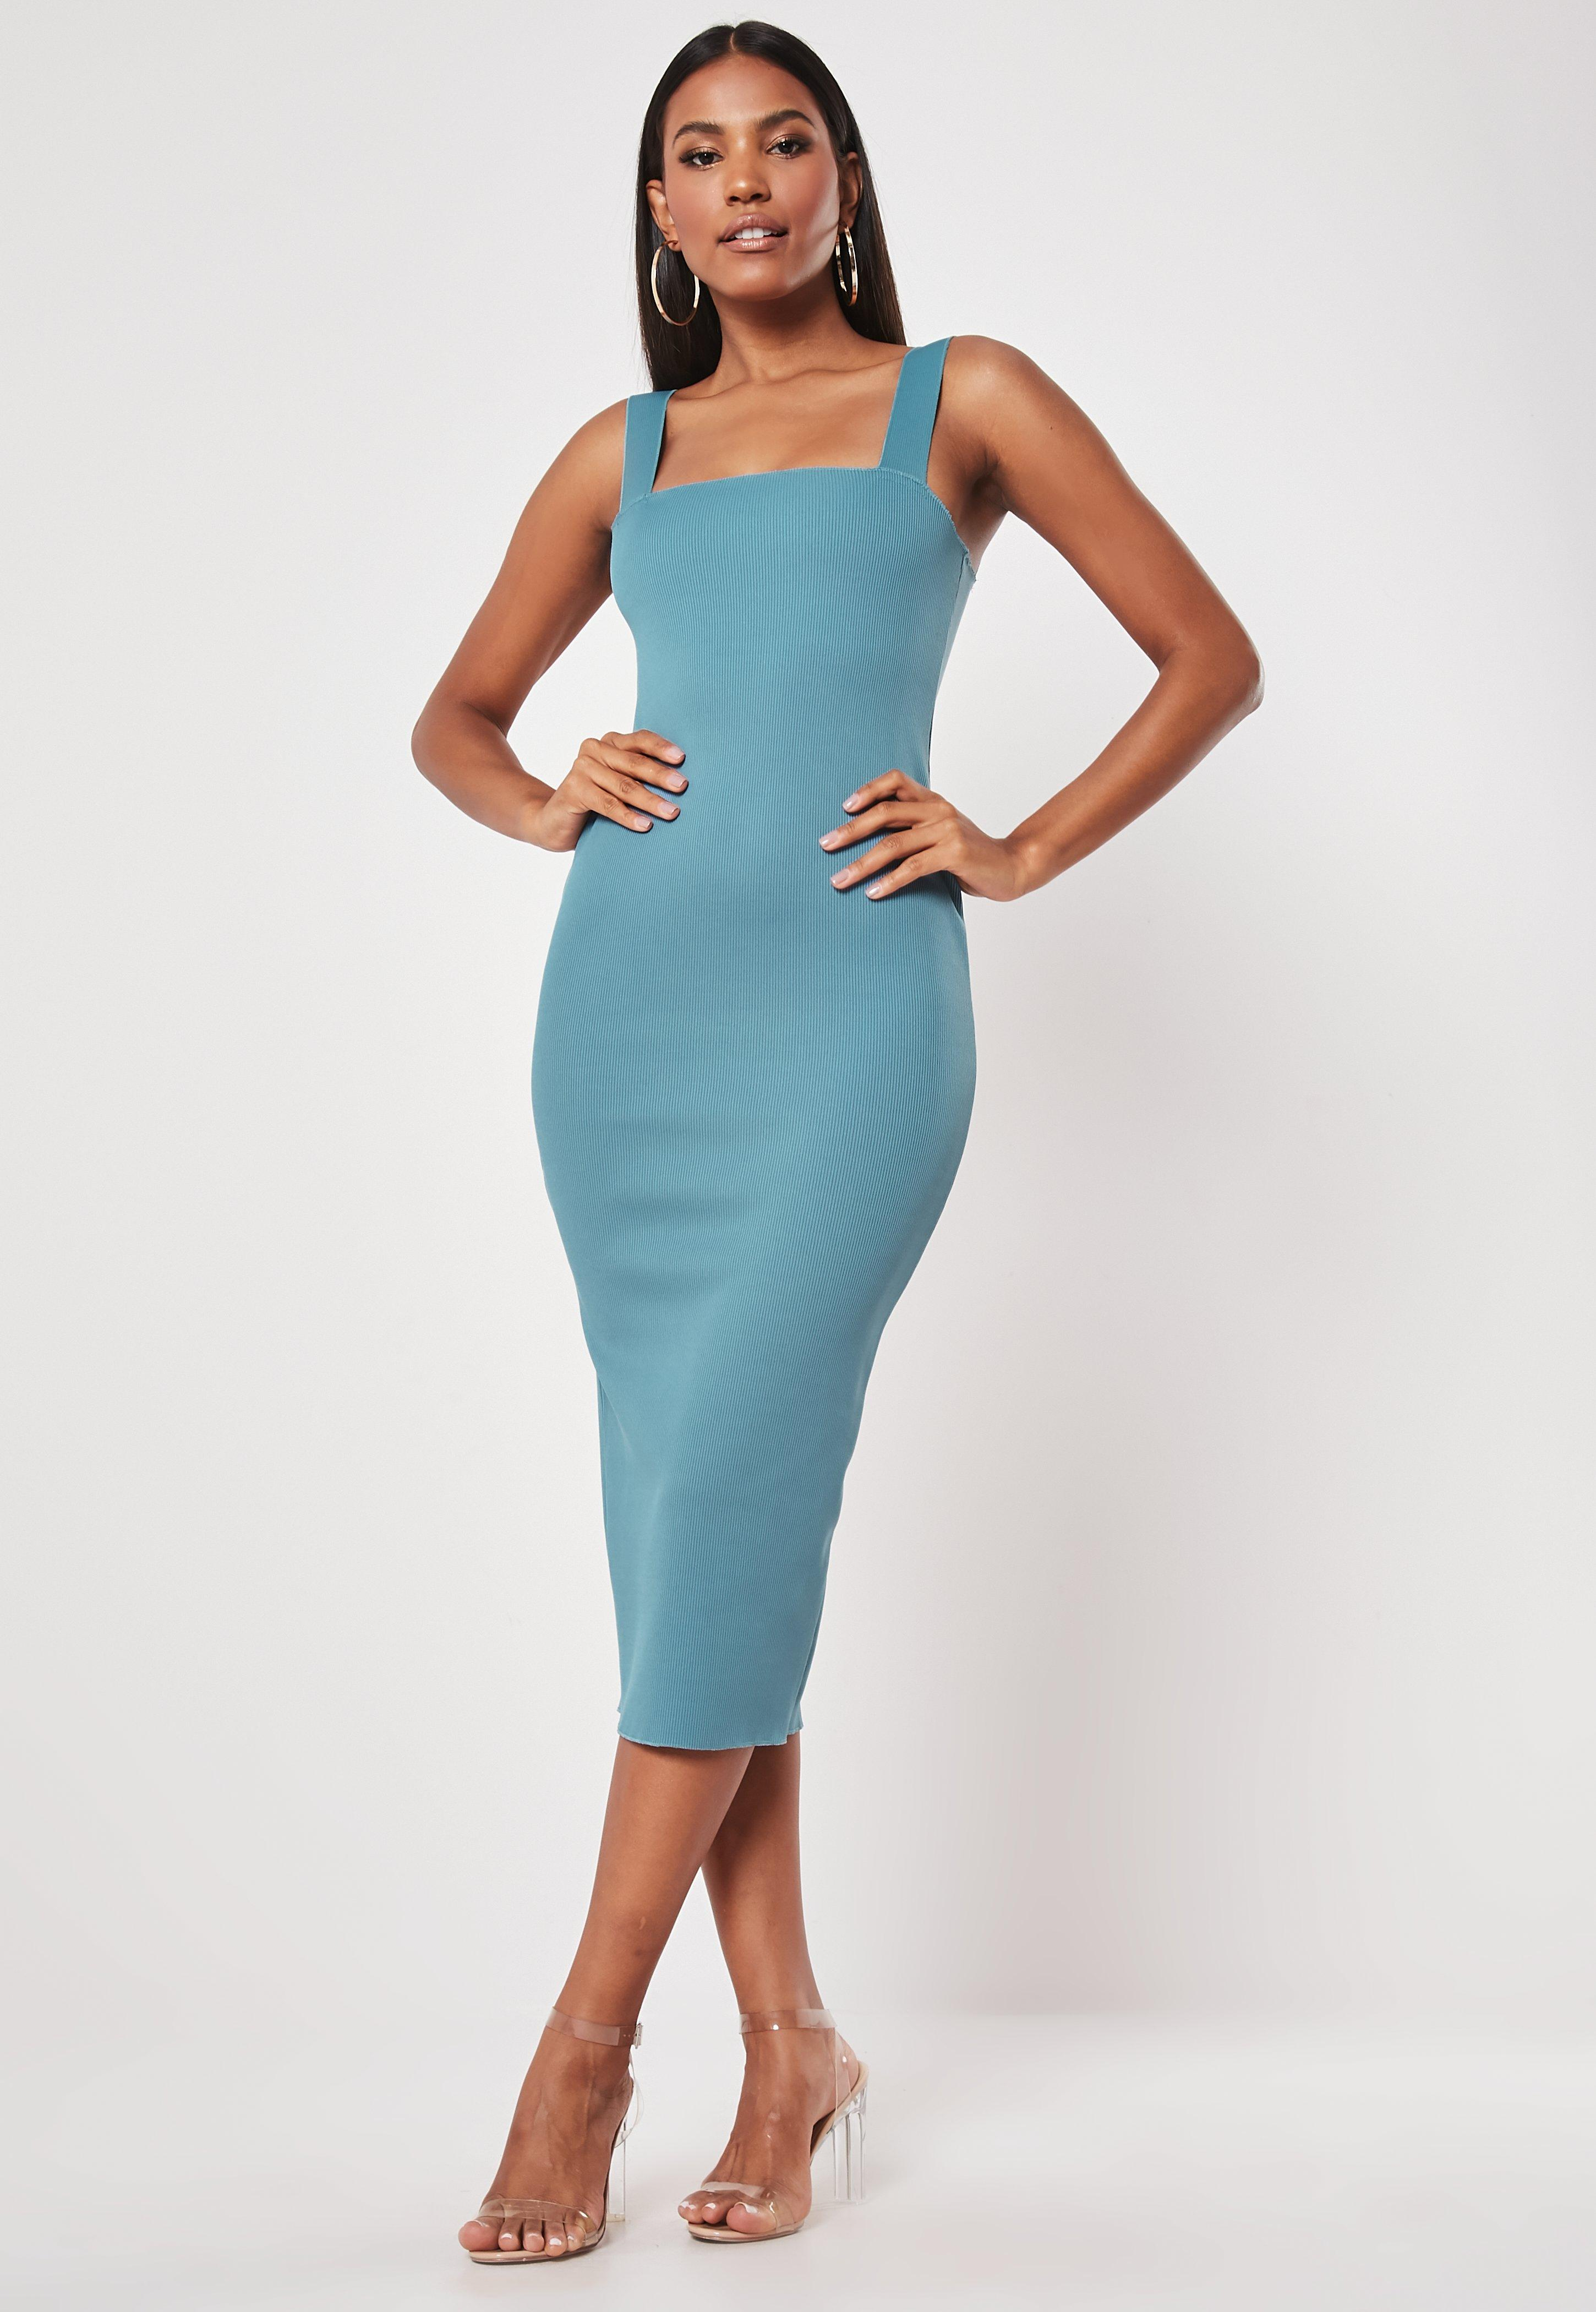 78cb4f60cb Bodycon Dresses | Tight & Fitted Dresses - Missguided Australia